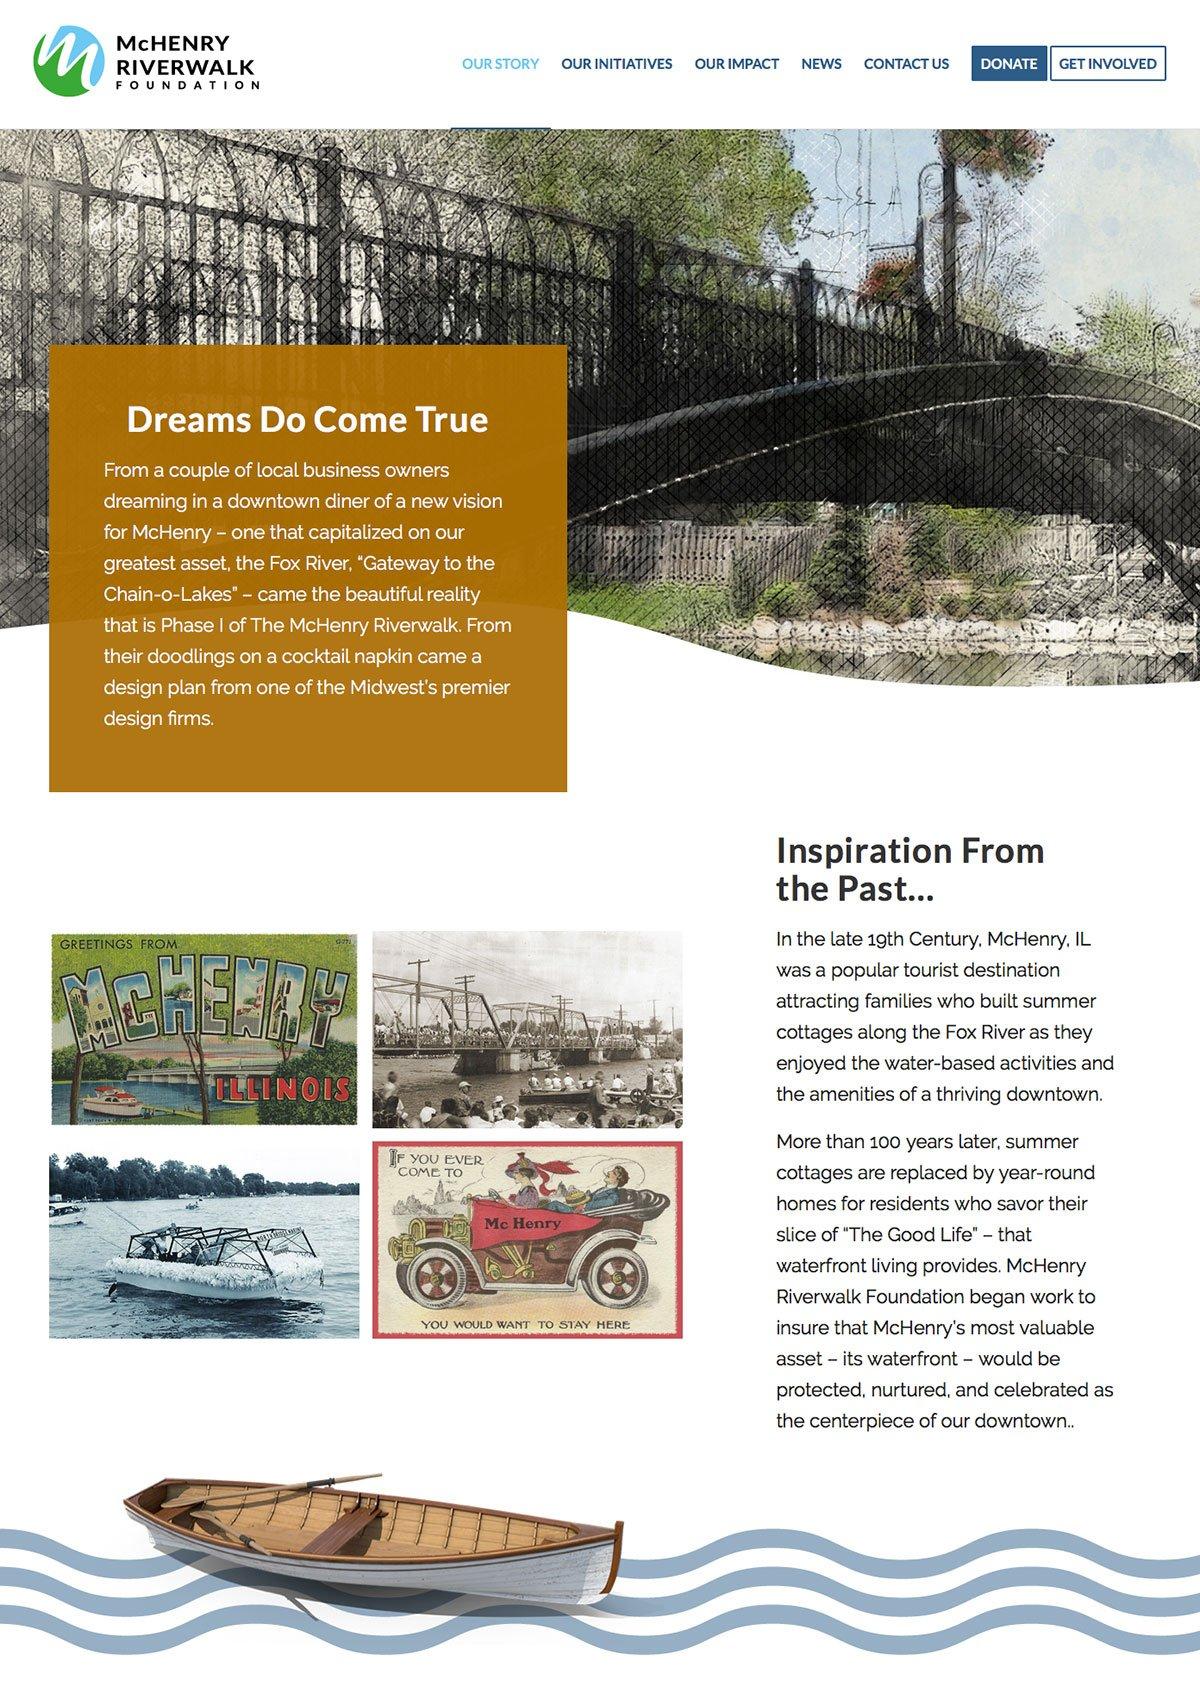 McHenry Riverwalk Foundation Story Page